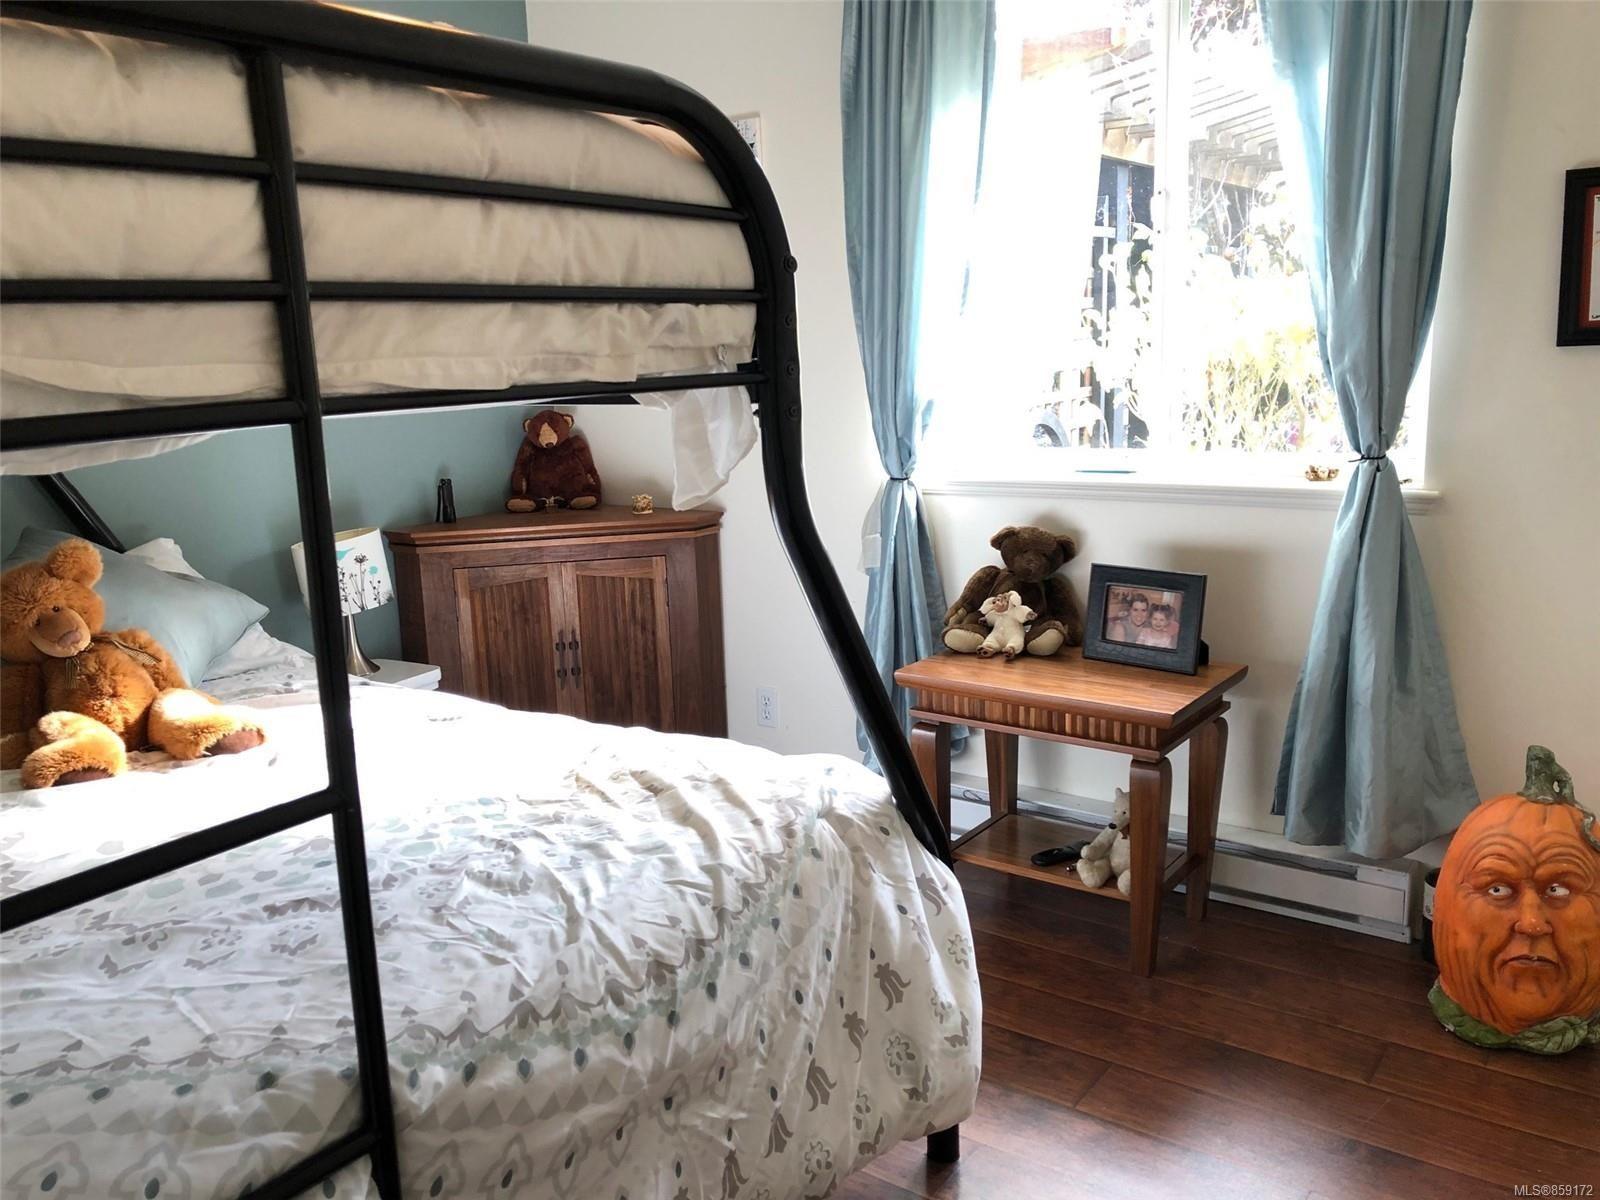 Photo 8: Photos: 1723 Karen's Crt in : PQ Qualicum North House for sale (Parksville/Qualicum)  : MLS®# 859172